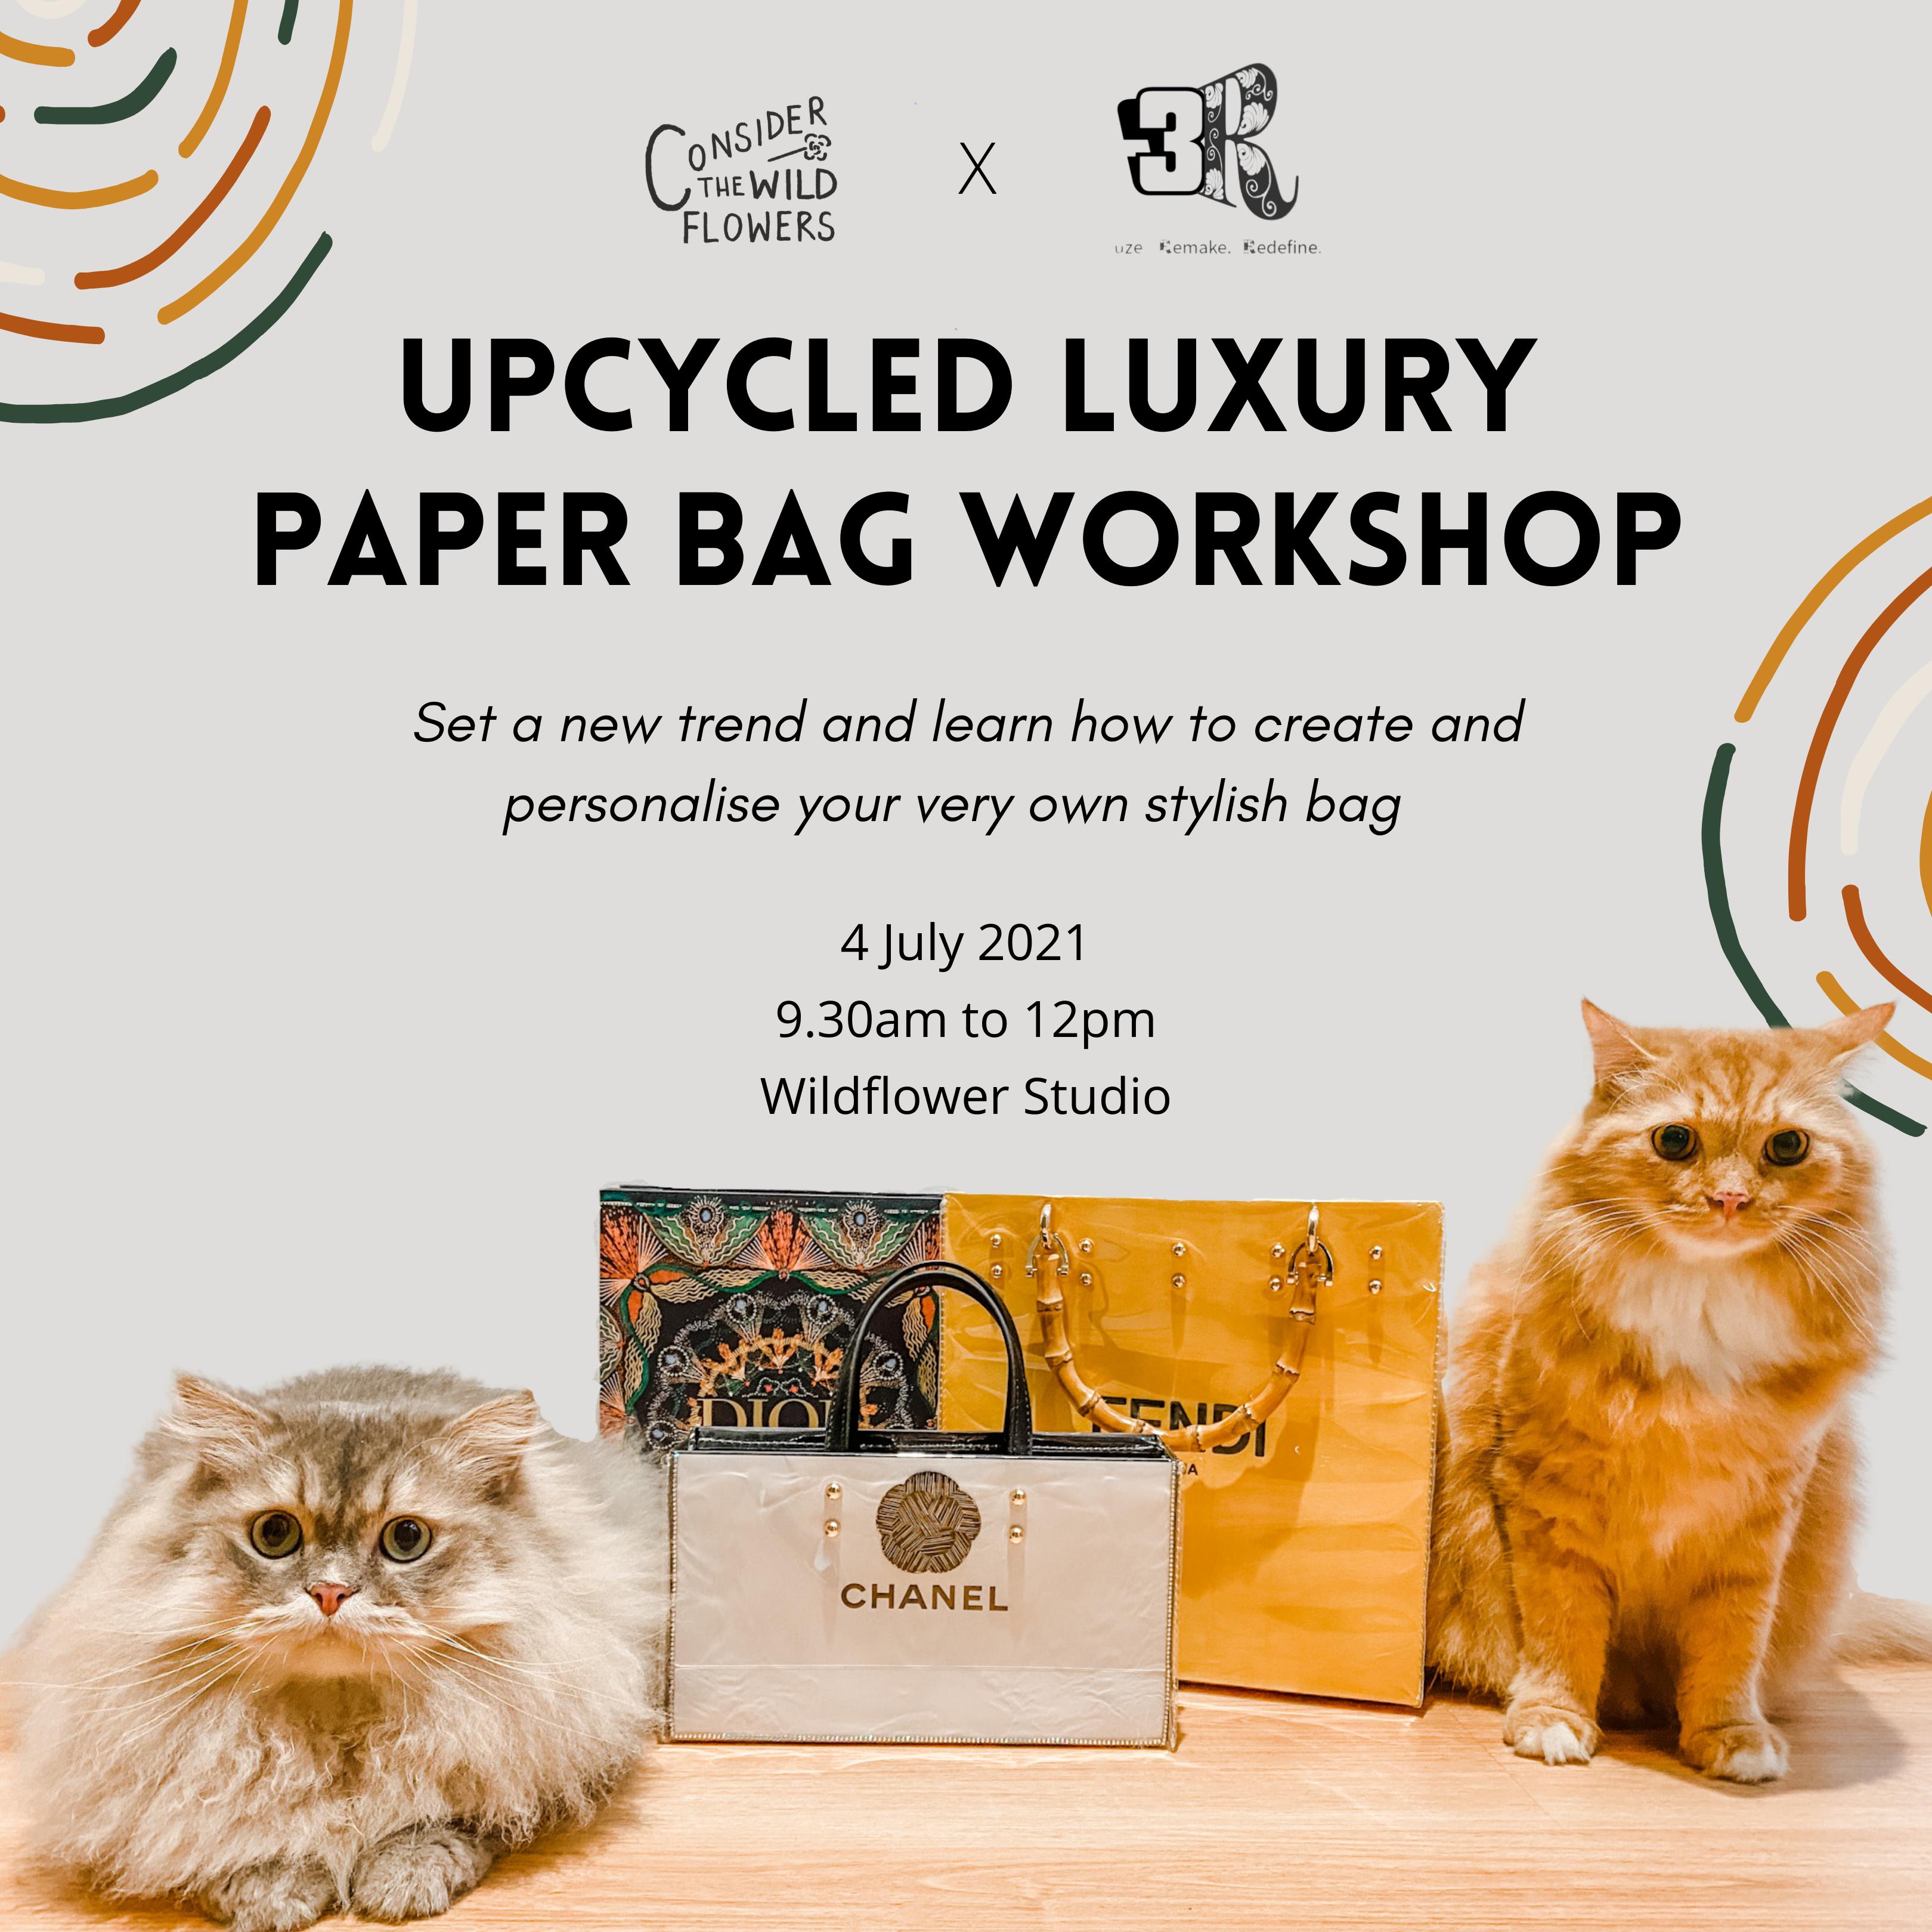 Upcycled Luxury Paper Bag Workshop